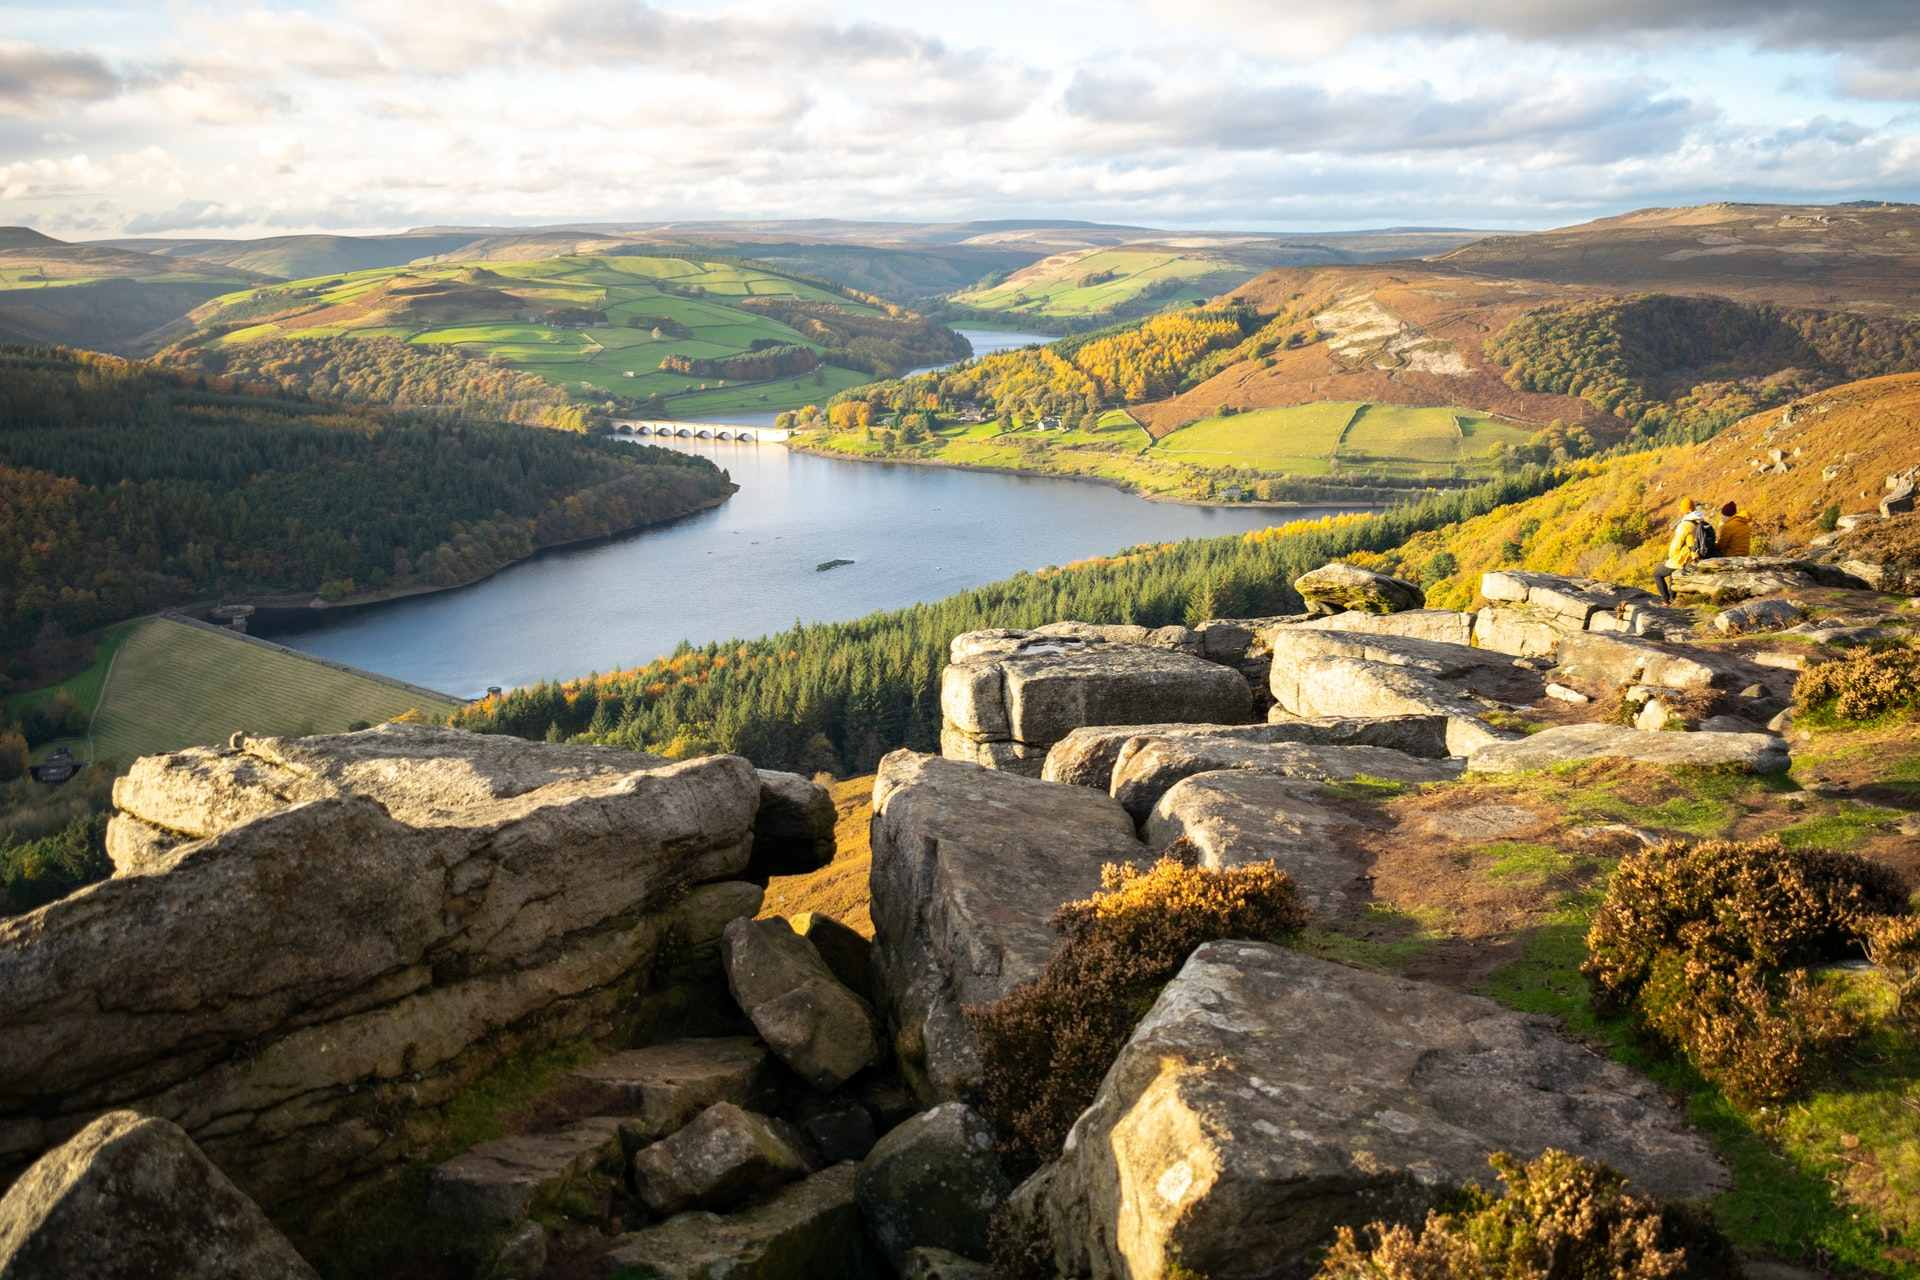 bamford-edge-in-the-hope-valley-overlooking-ladybower-reservoir-at-sunset-best-peak-district-walks